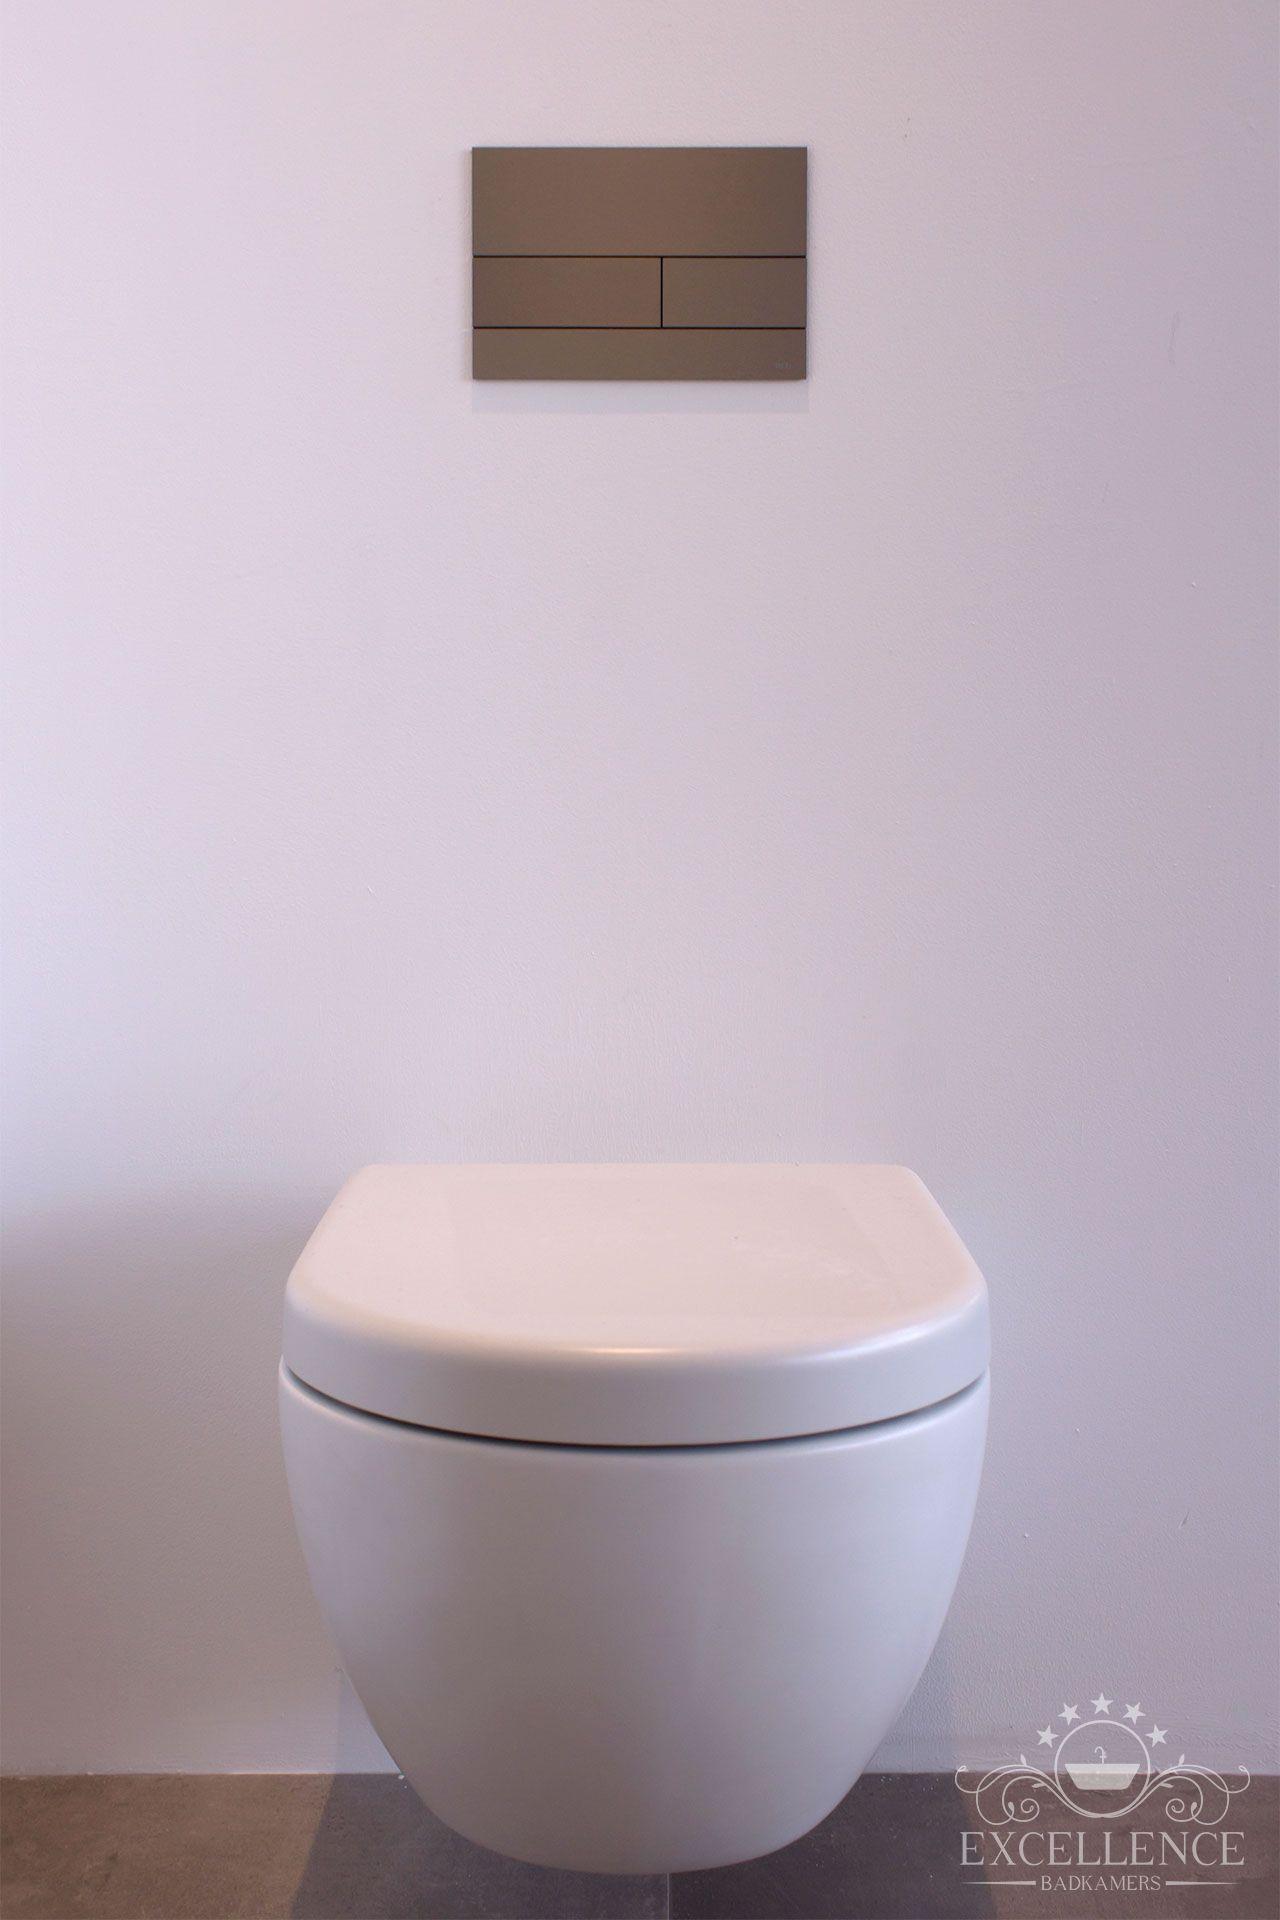 Maatwerk badkamer. Design wandcloset mat wit. Design ...